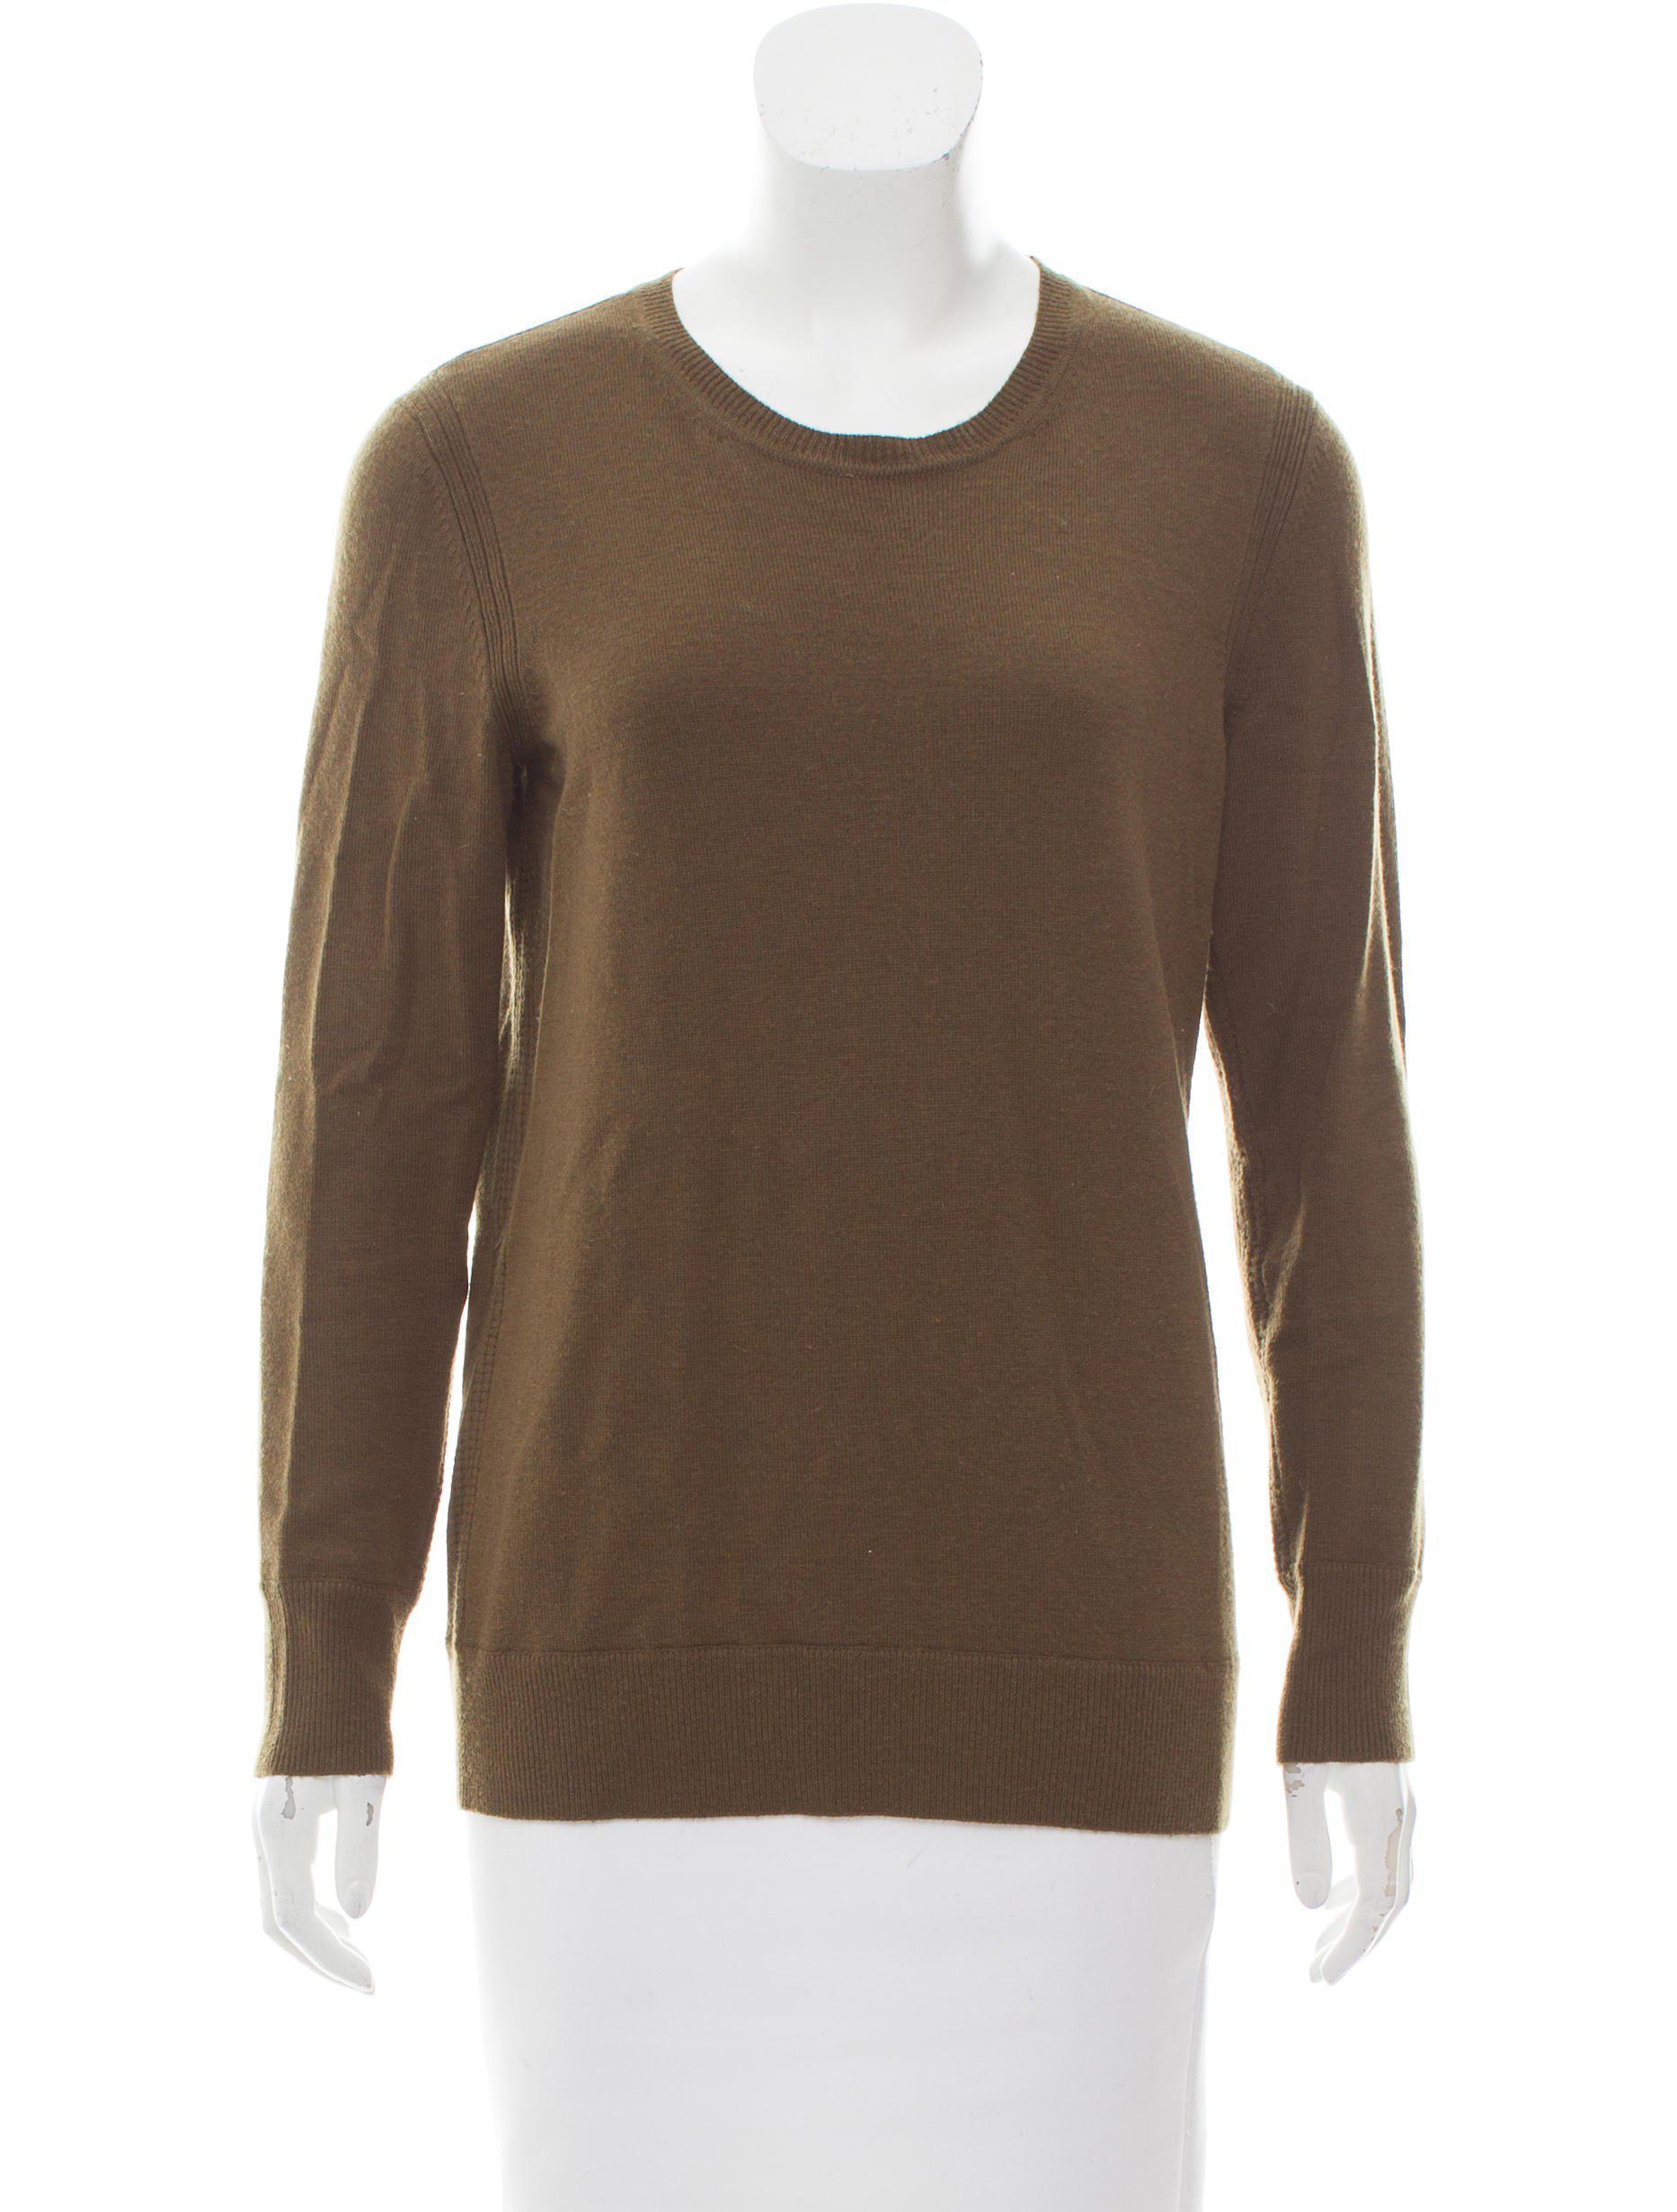 edafdc463a7f Lyst - Rag   Bone Wool Lightweight Sweater Olive in Green